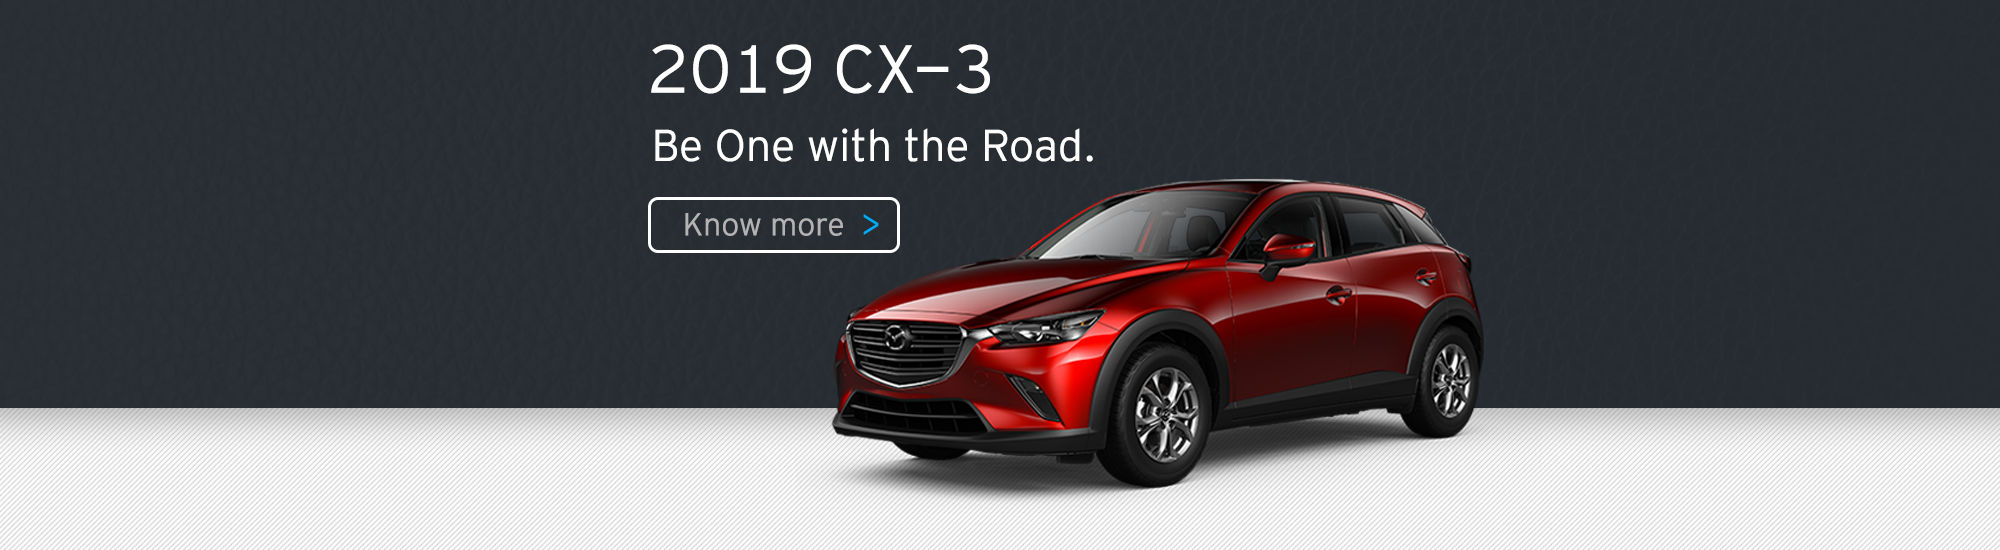 2019 CX-3